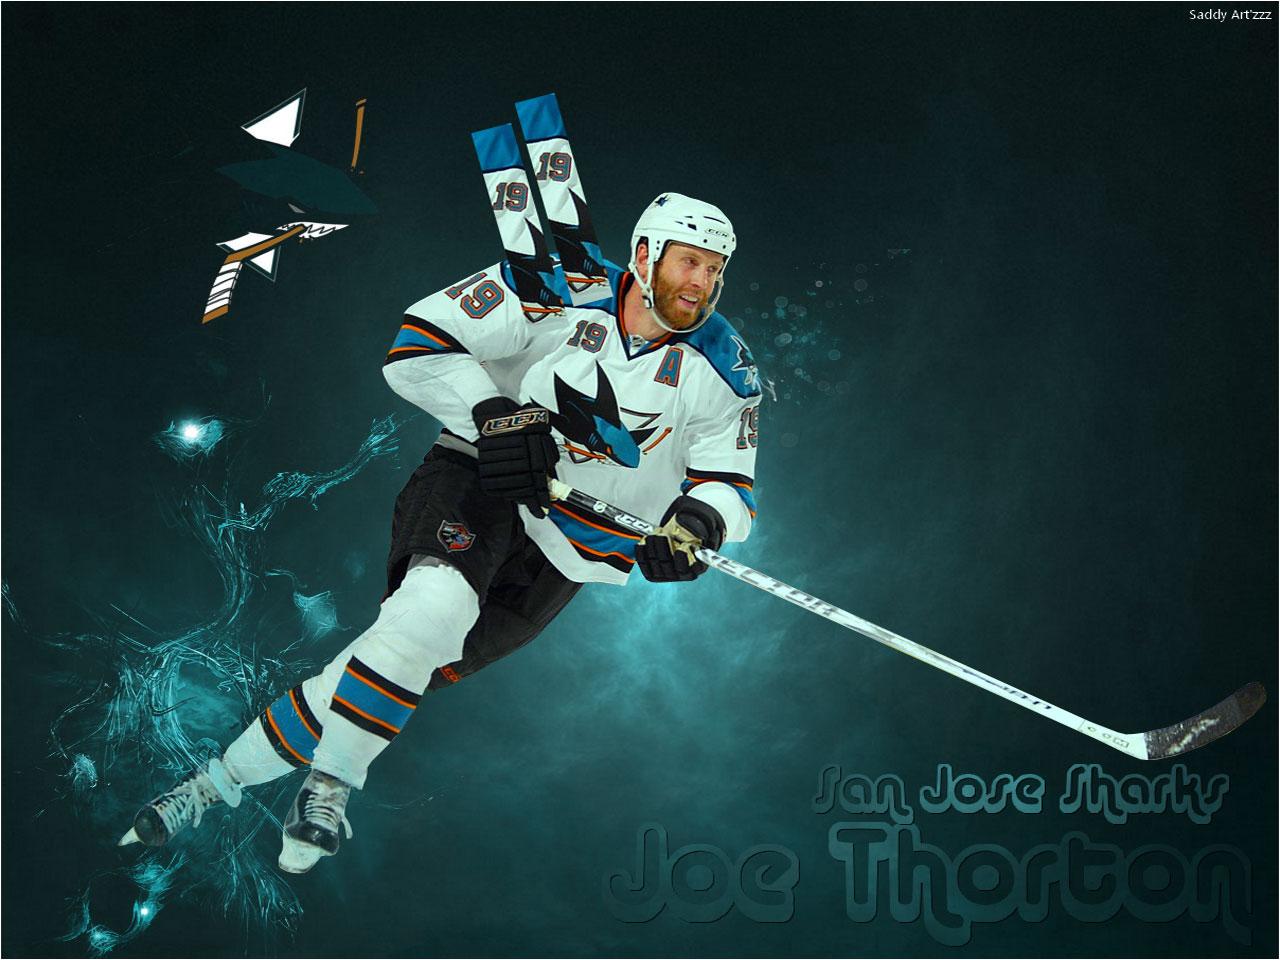 1280x960px NHL Wallpaper Downloads 1280x960